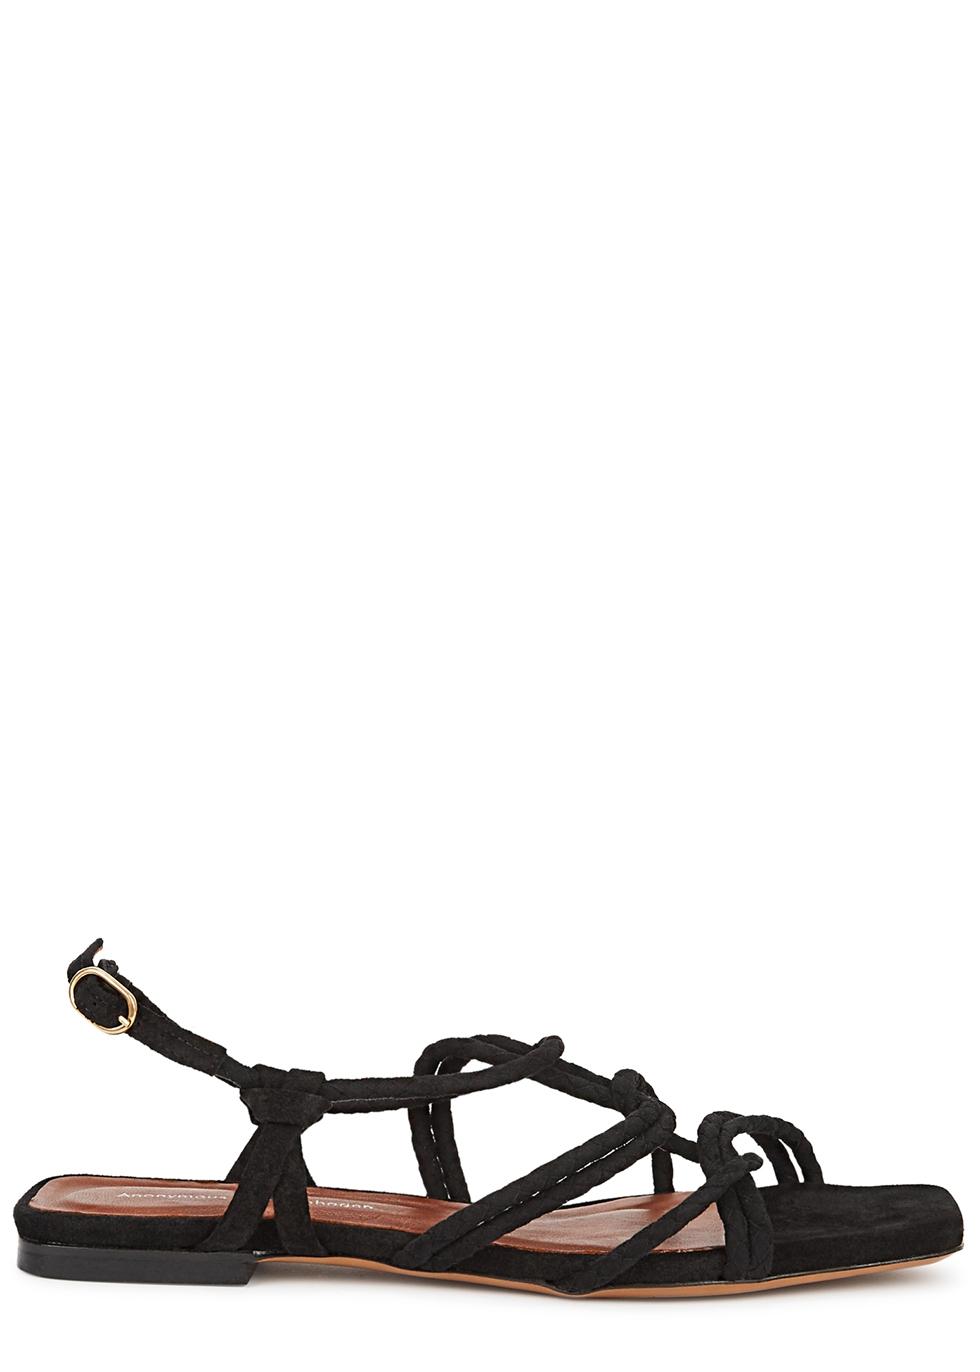 Hayes black suede sandals